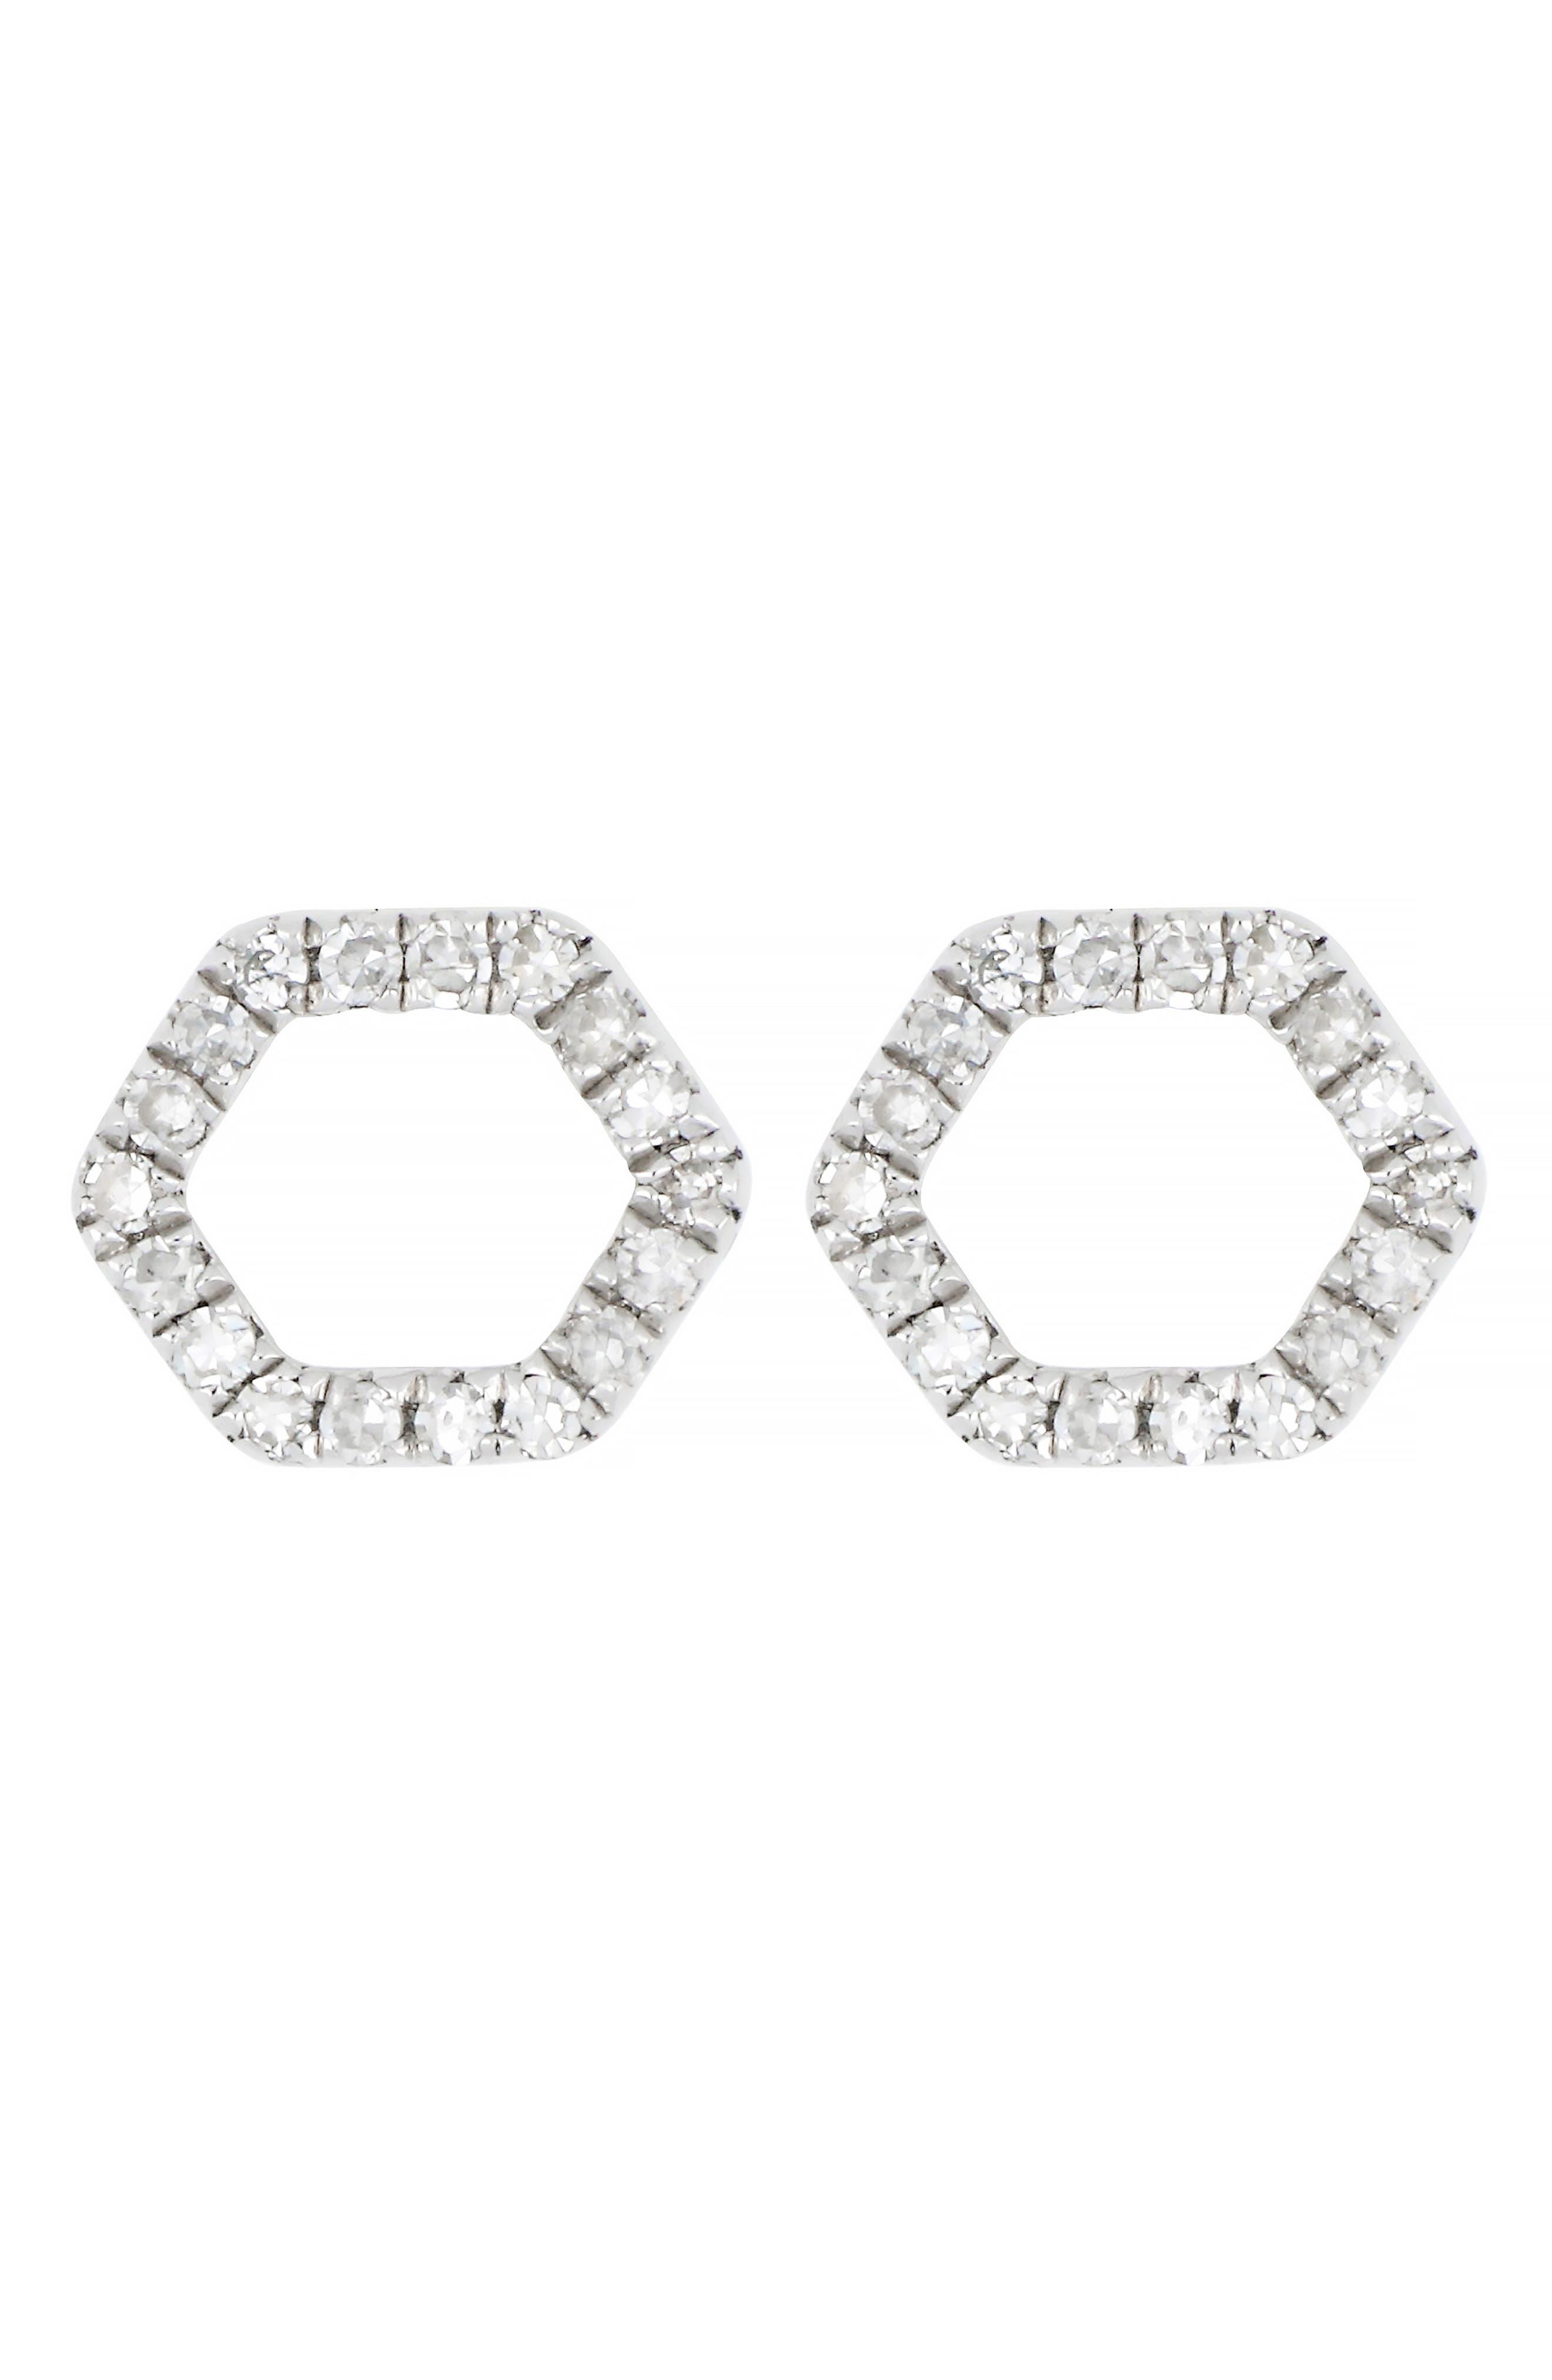 CARRIERE JEWELRY Carrière Diamond Hexagon Stud Earrings, Main, color, SILVER/ DIAMOND